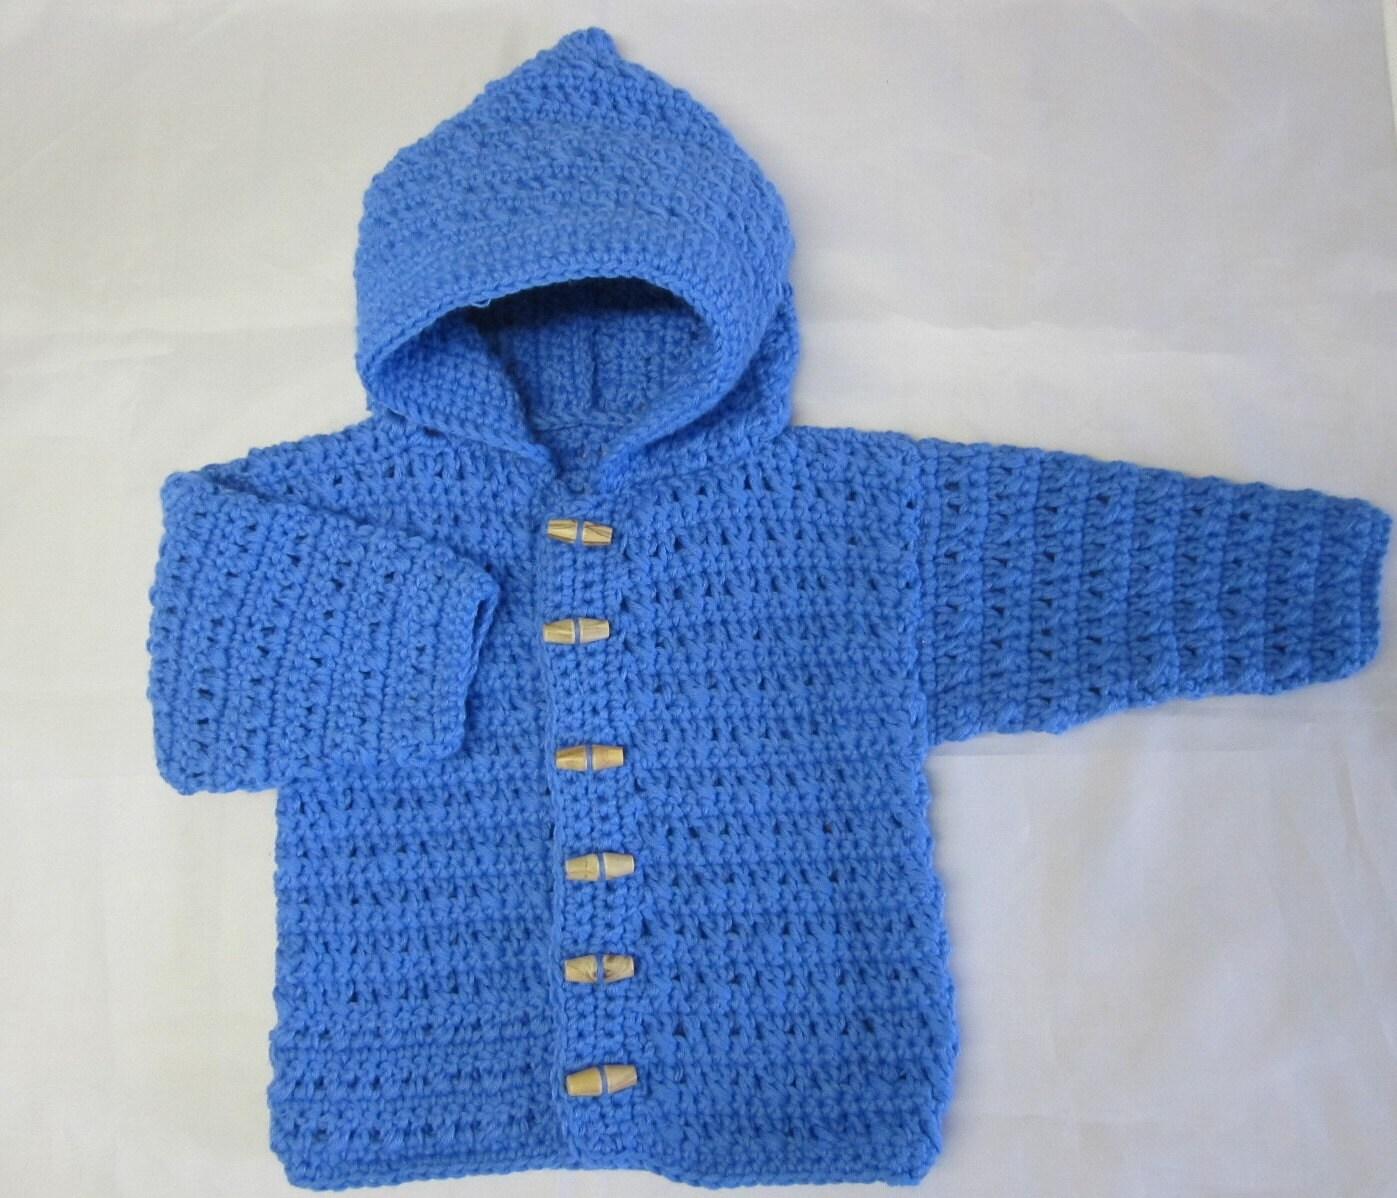 Baby Boy Sweater Crochet Pattern Bronze Cardigan